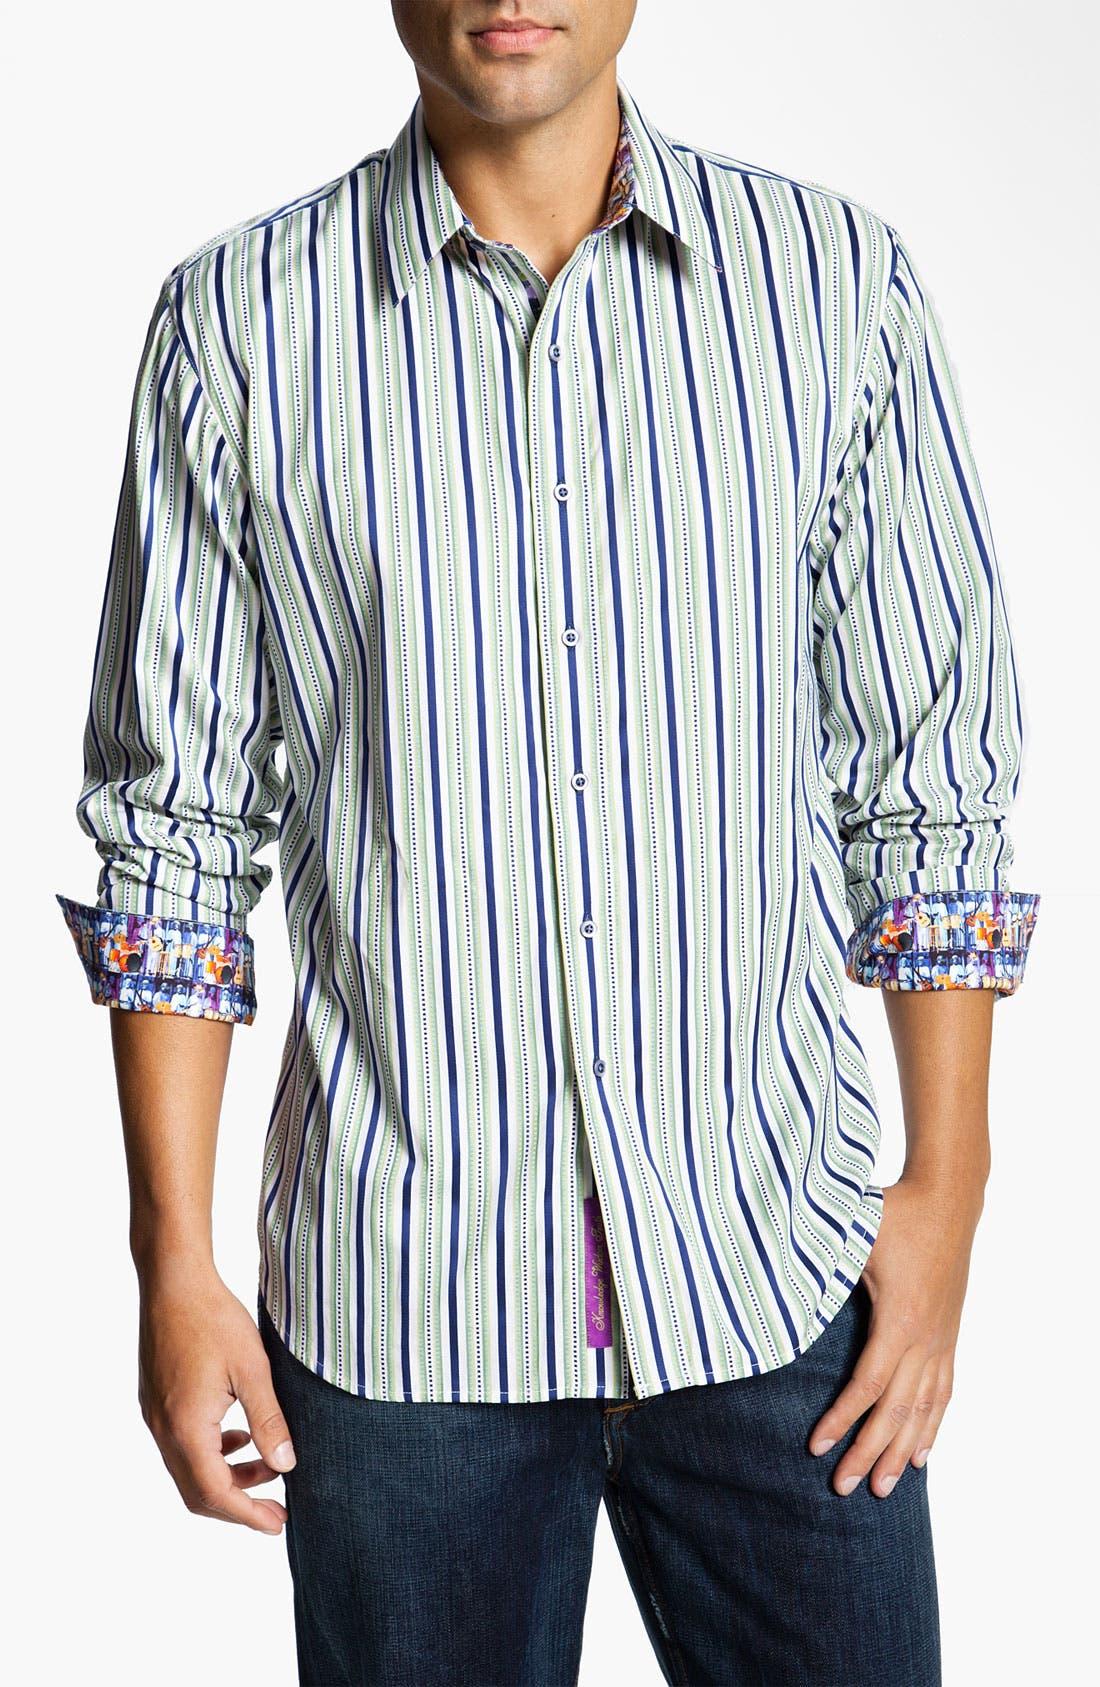 Alternate Image 1 Selected - Robert Graham 'Aquitane' Sport Shirt